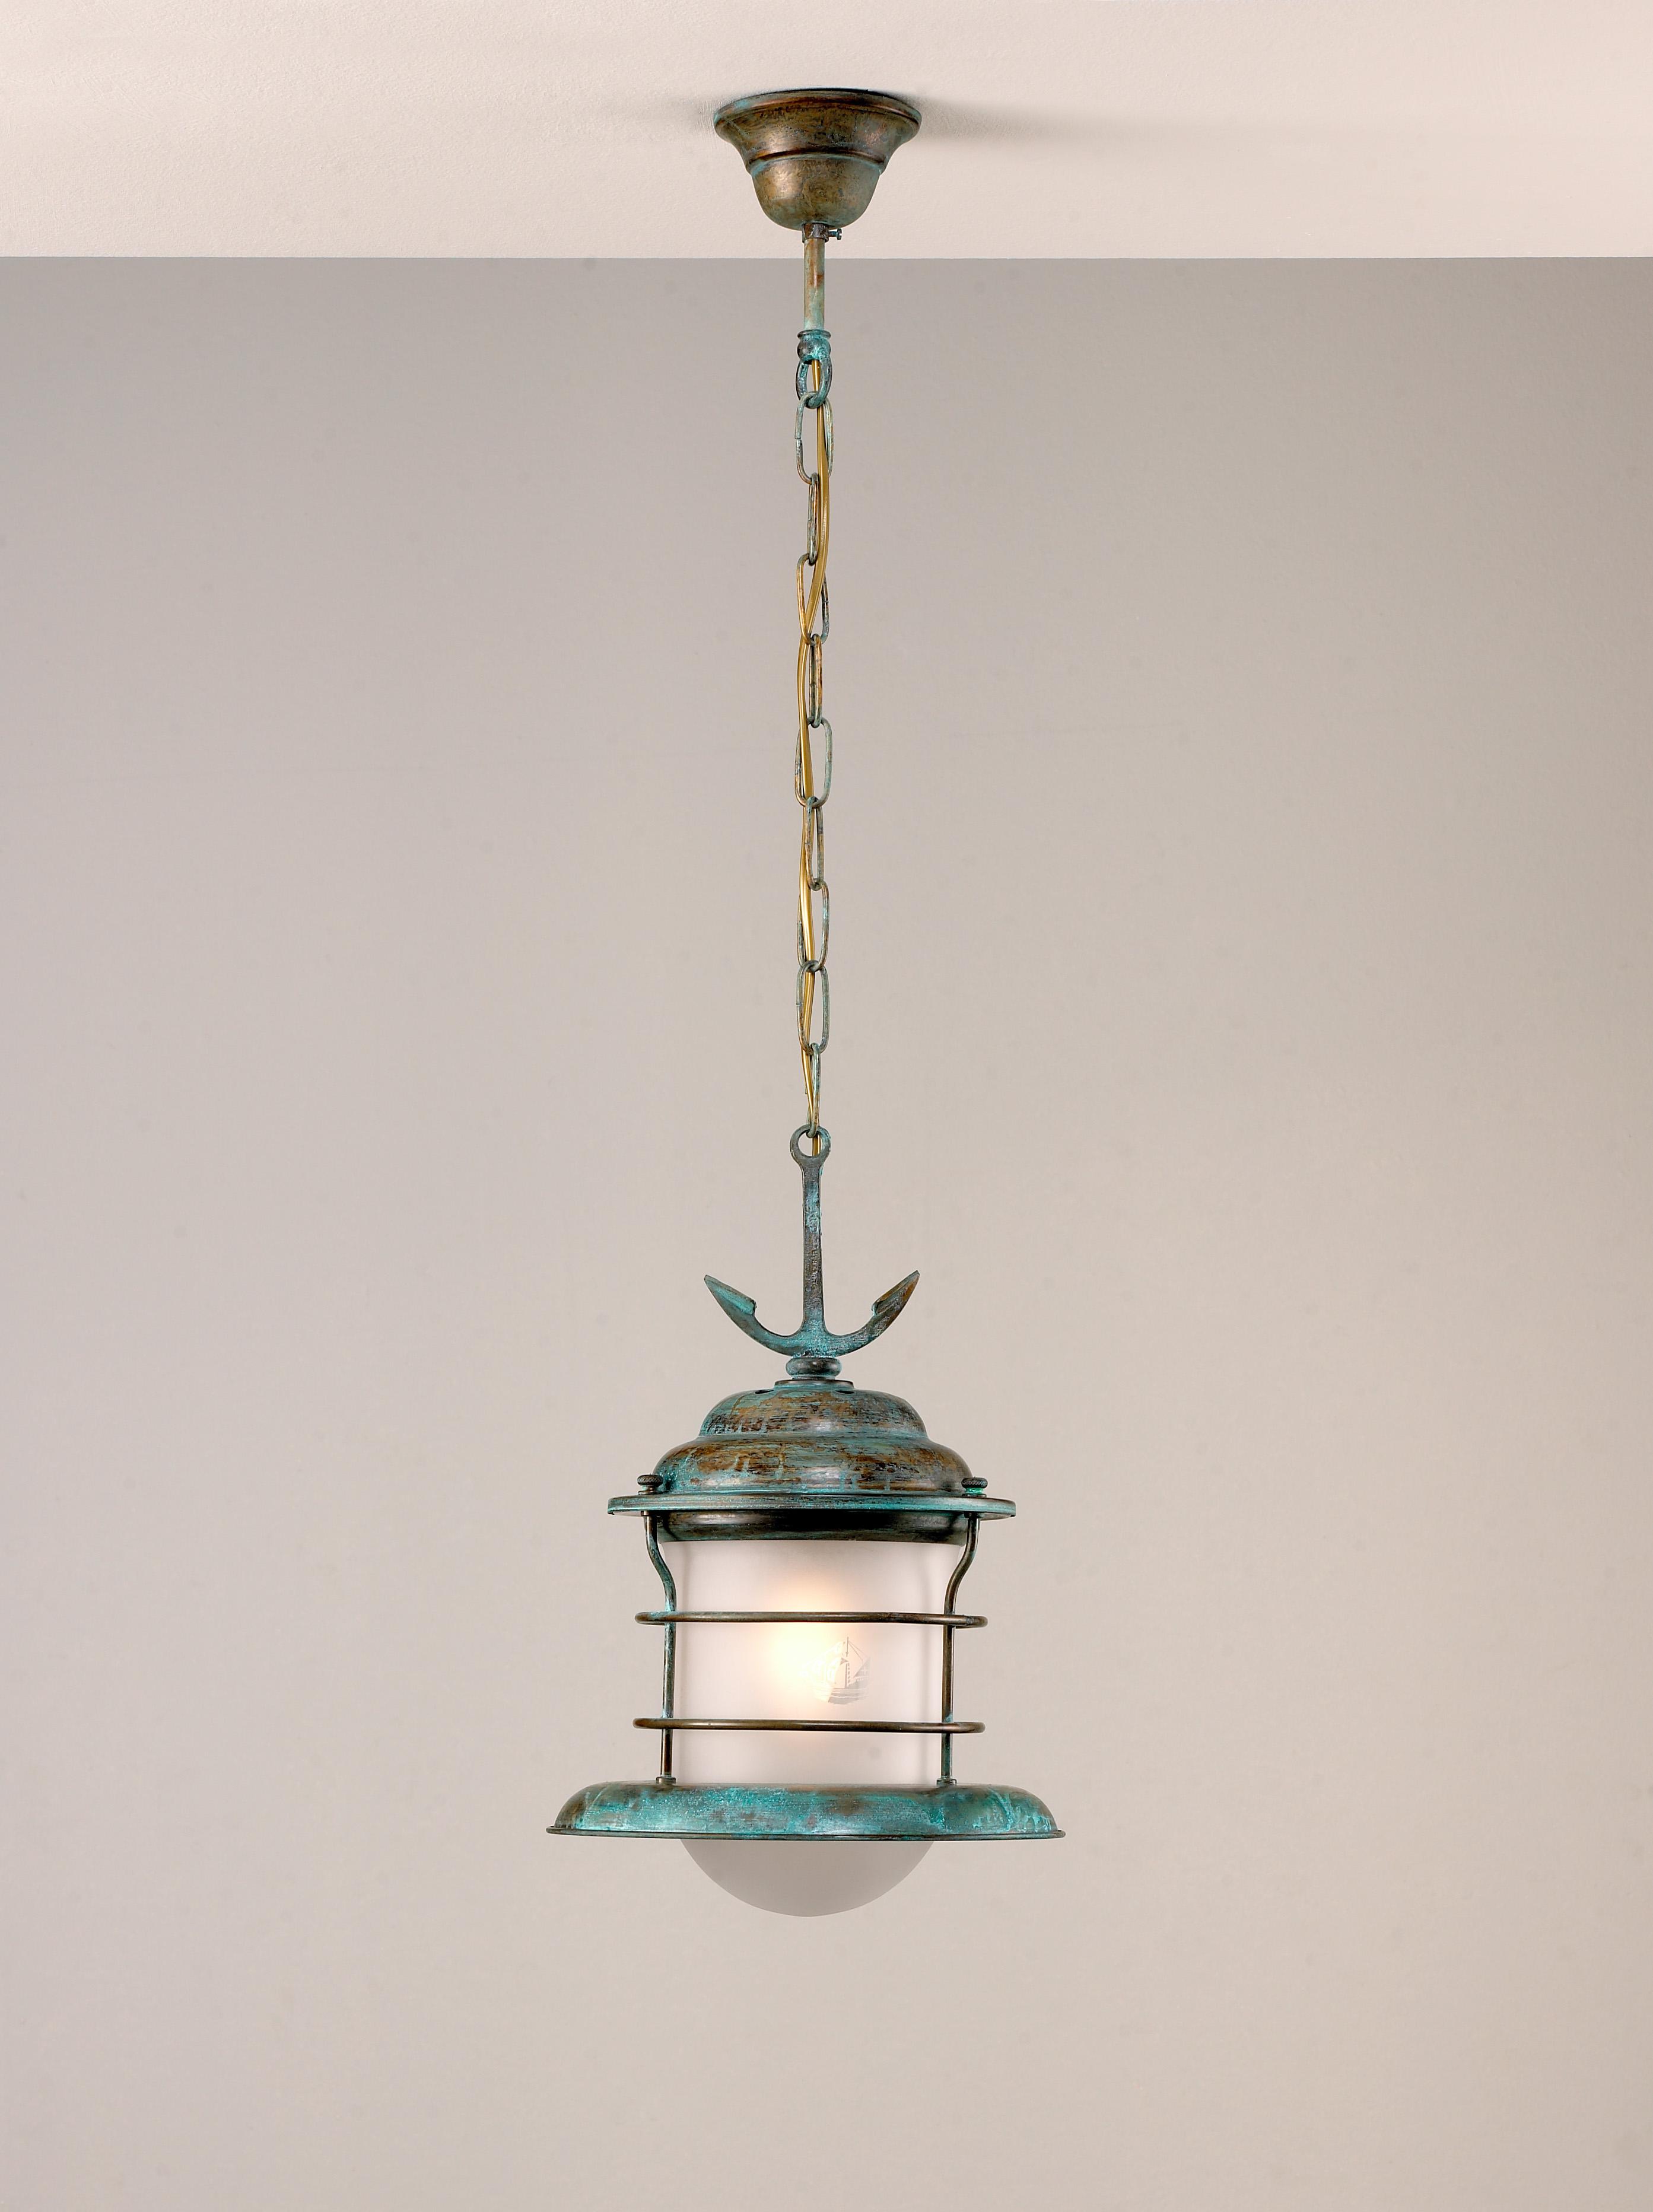 NAUTICAL DETAILS LANTERNS LAMPS AND LIGHTING Go Nautical : 259 from gonautical.wordpress.com size 2786 x 3728 jpeg 974kB